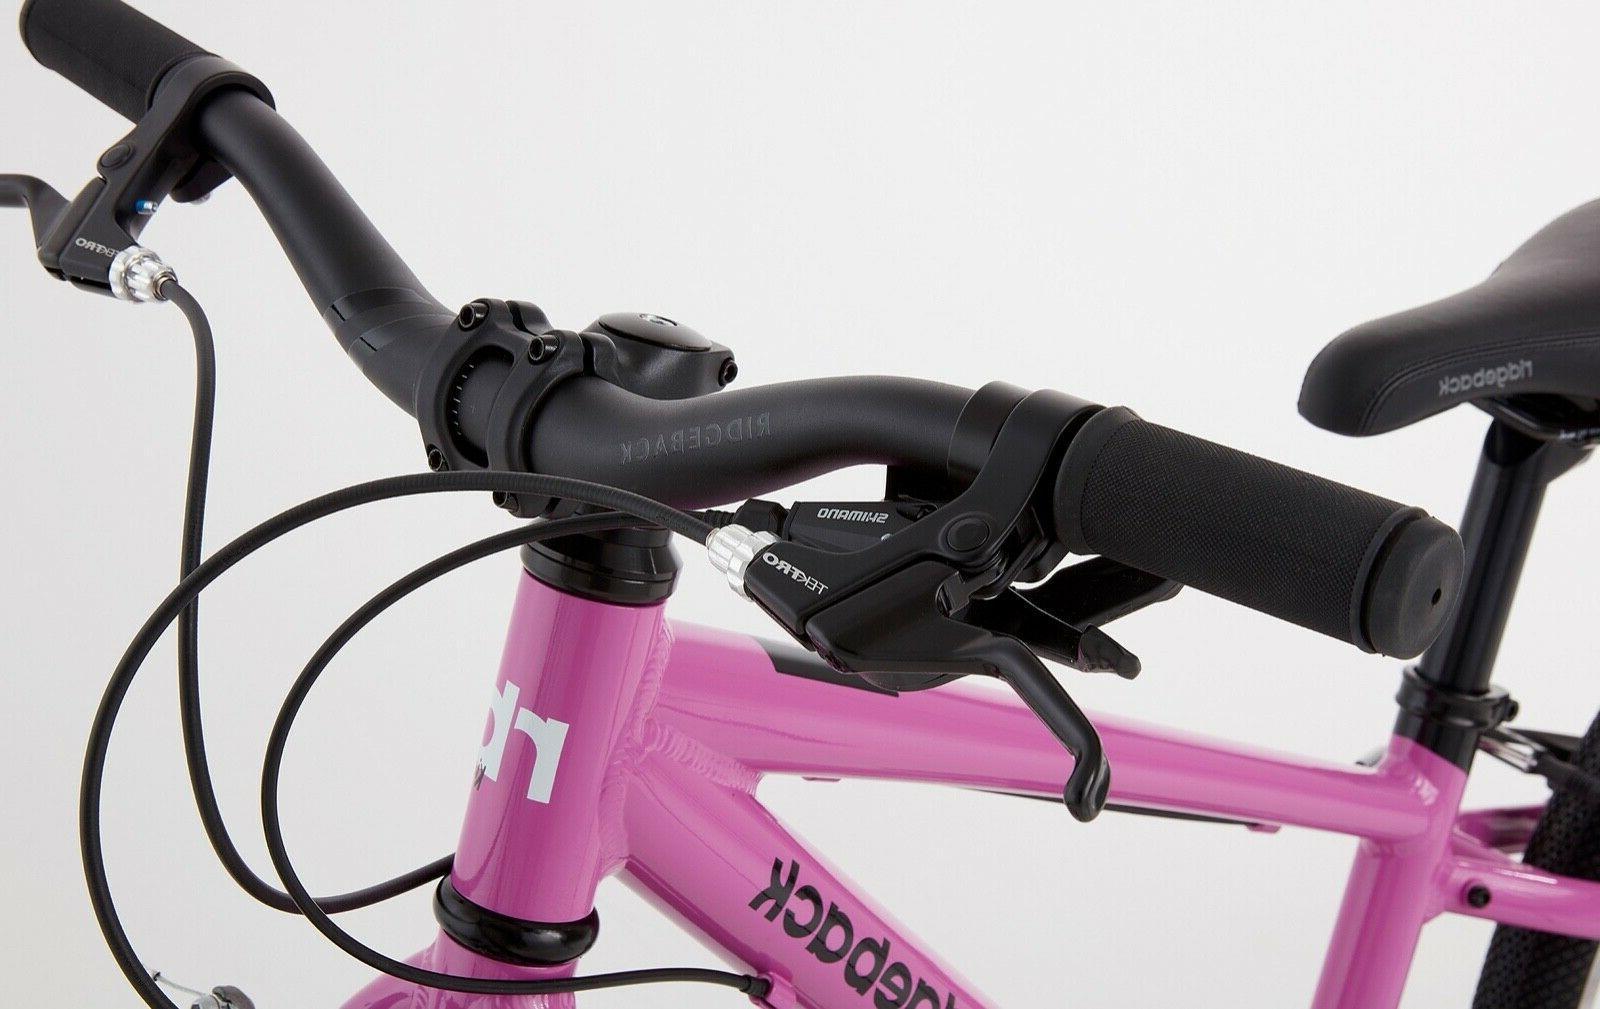 Ridgeback Dimension Bike